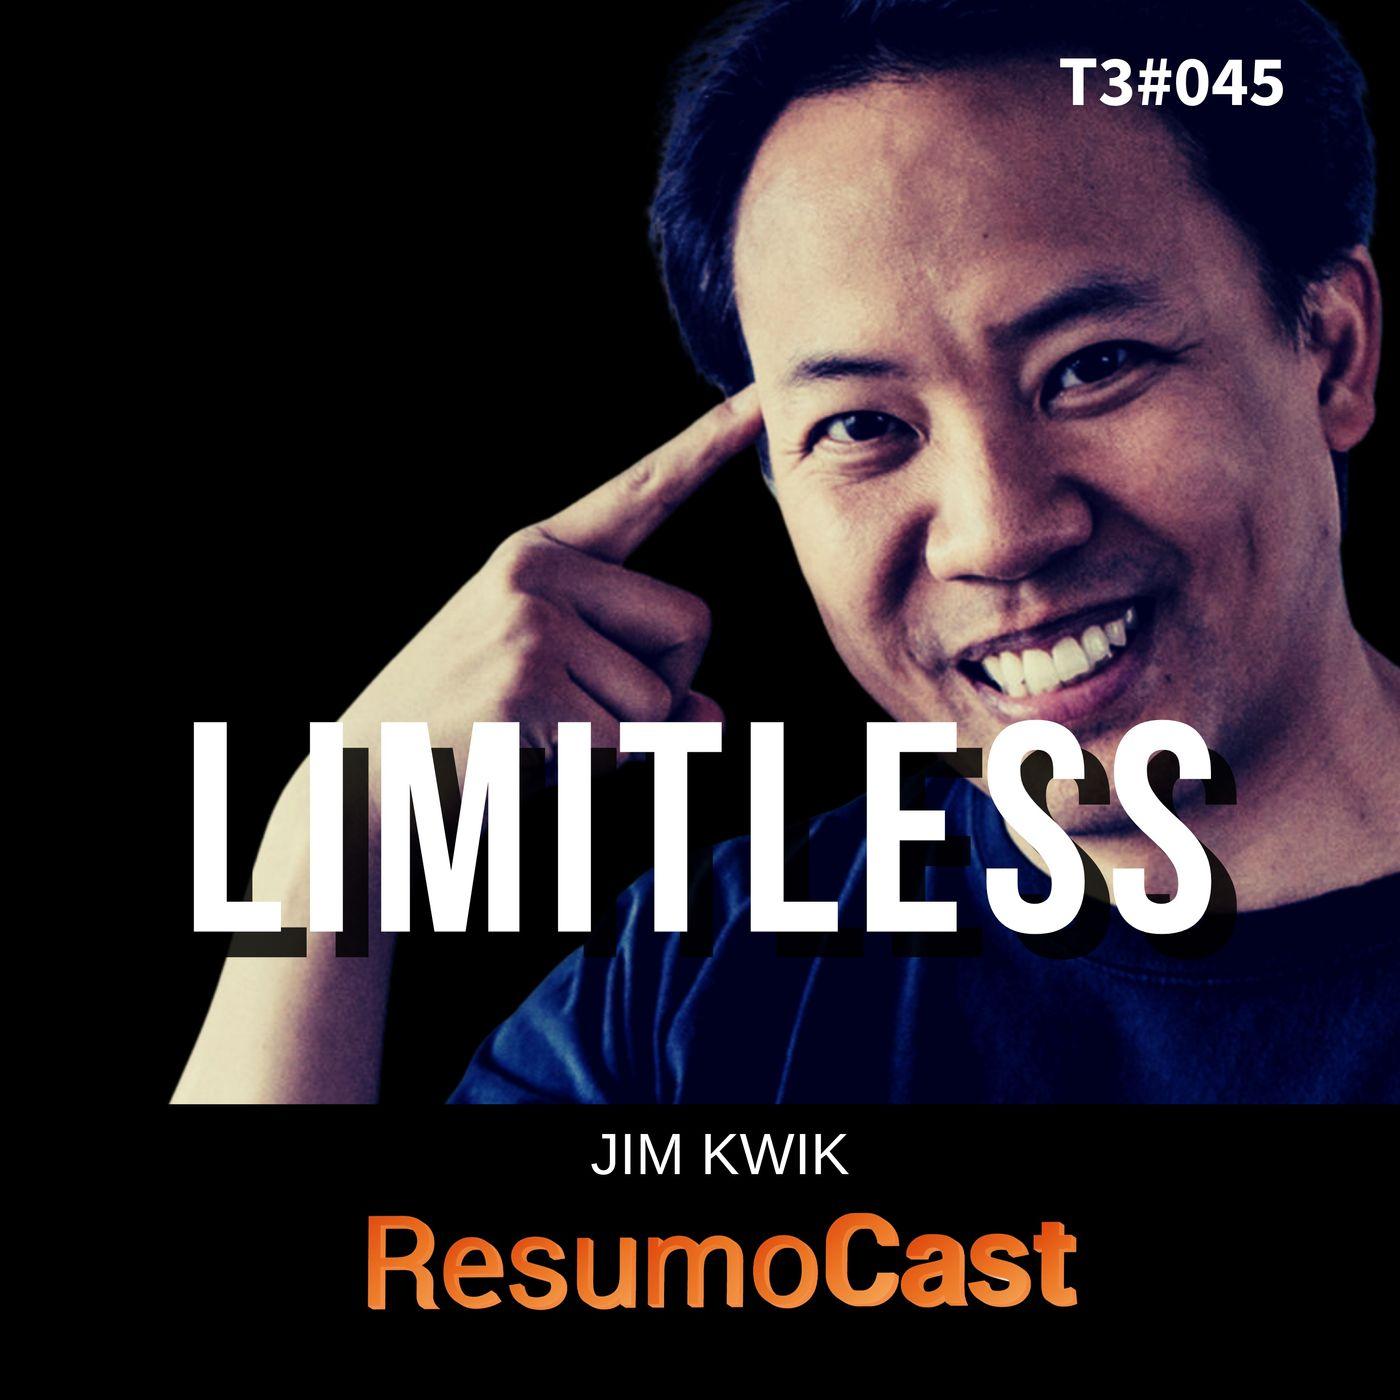 T3#045 Limitless, Sem limites   Jim Kwik